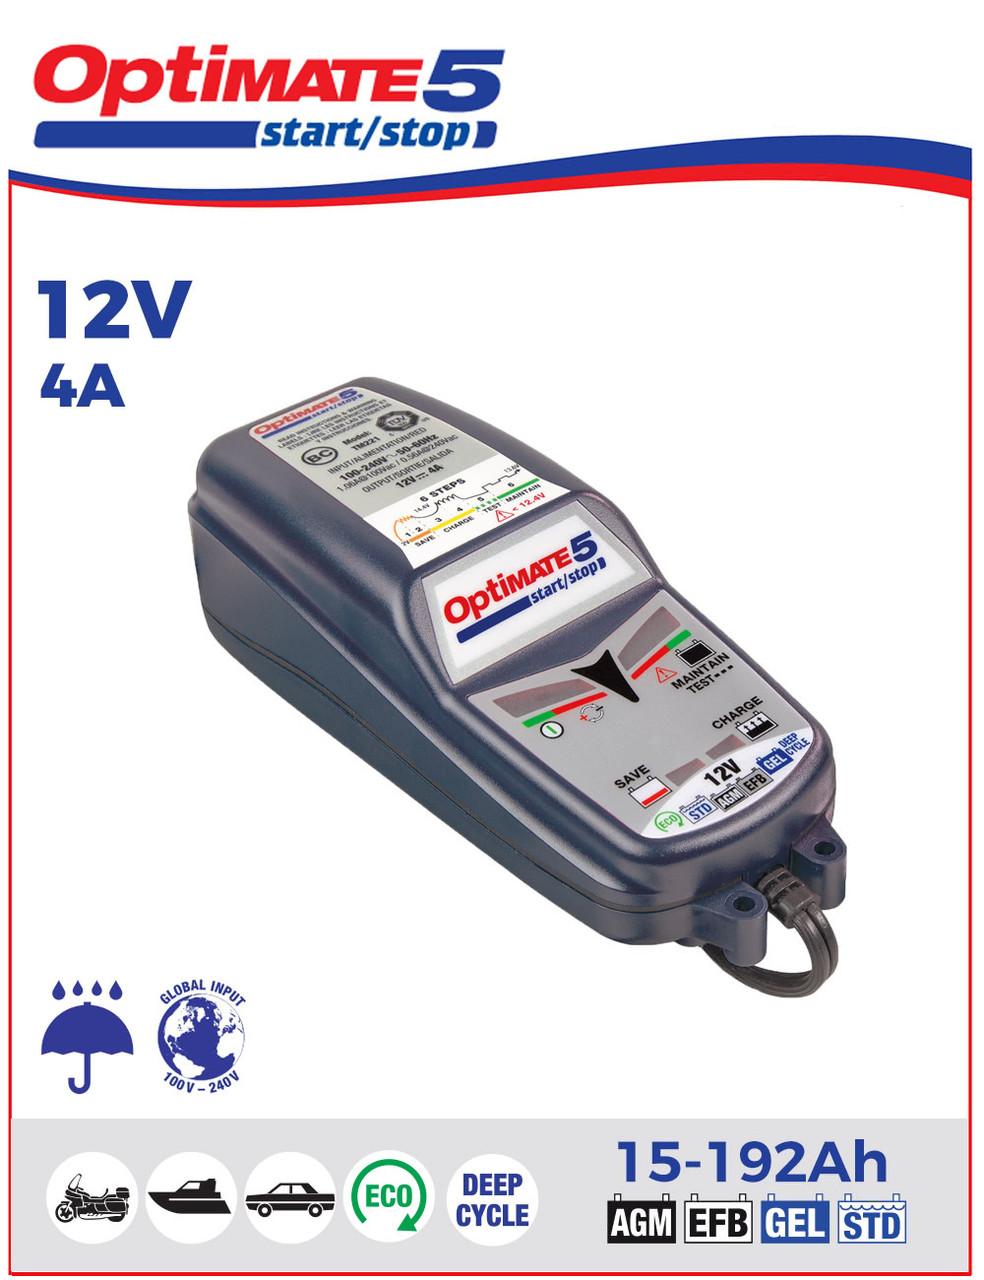 Зарядное устройство ™OptiMate 5 4А Start-Stop TM220 (1x4A, 12V)